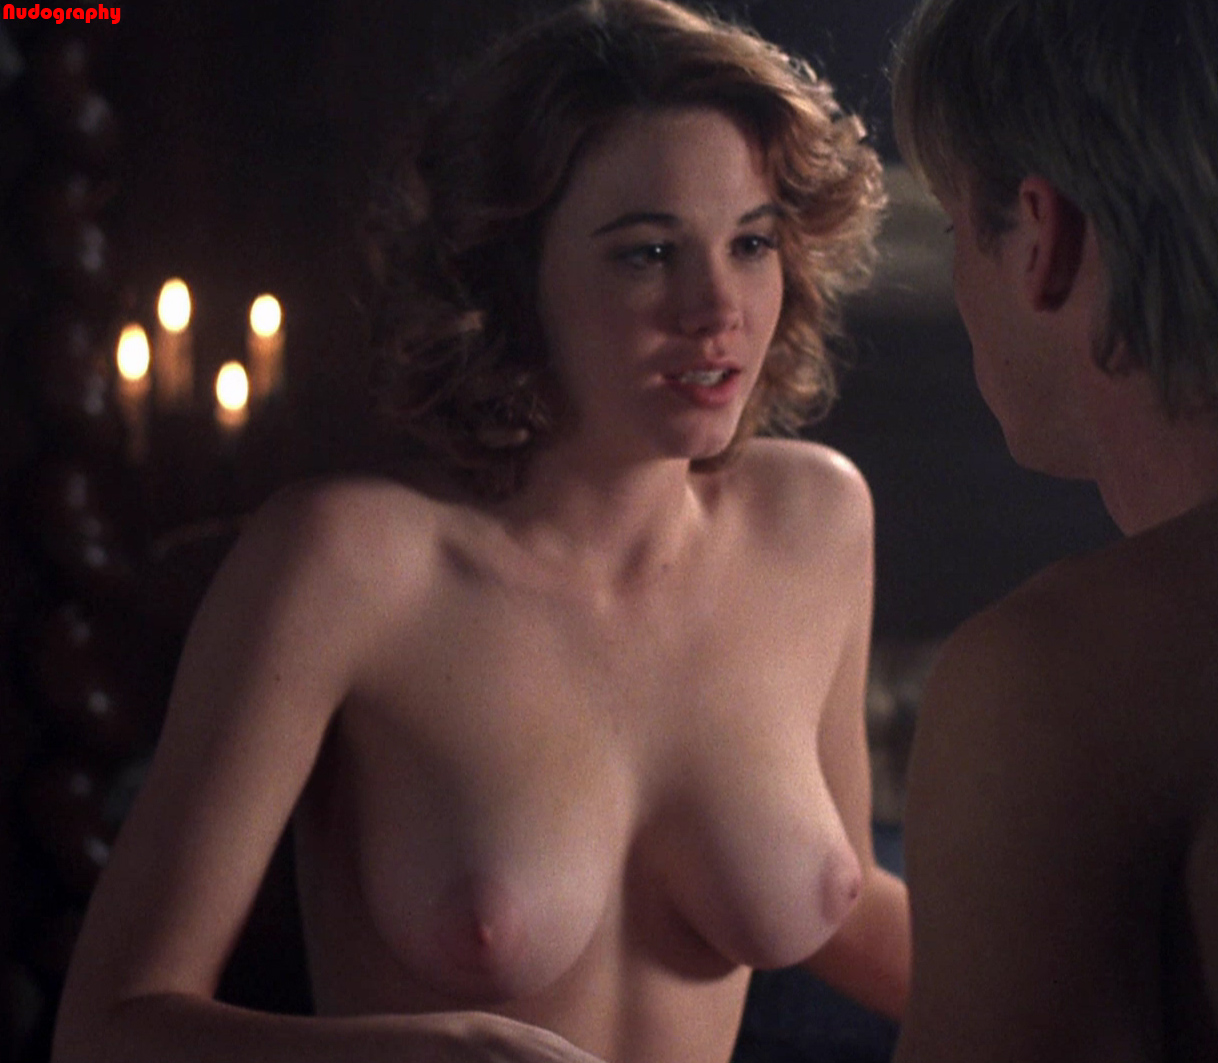 Naked Photos Of Christina Applegate photo 16